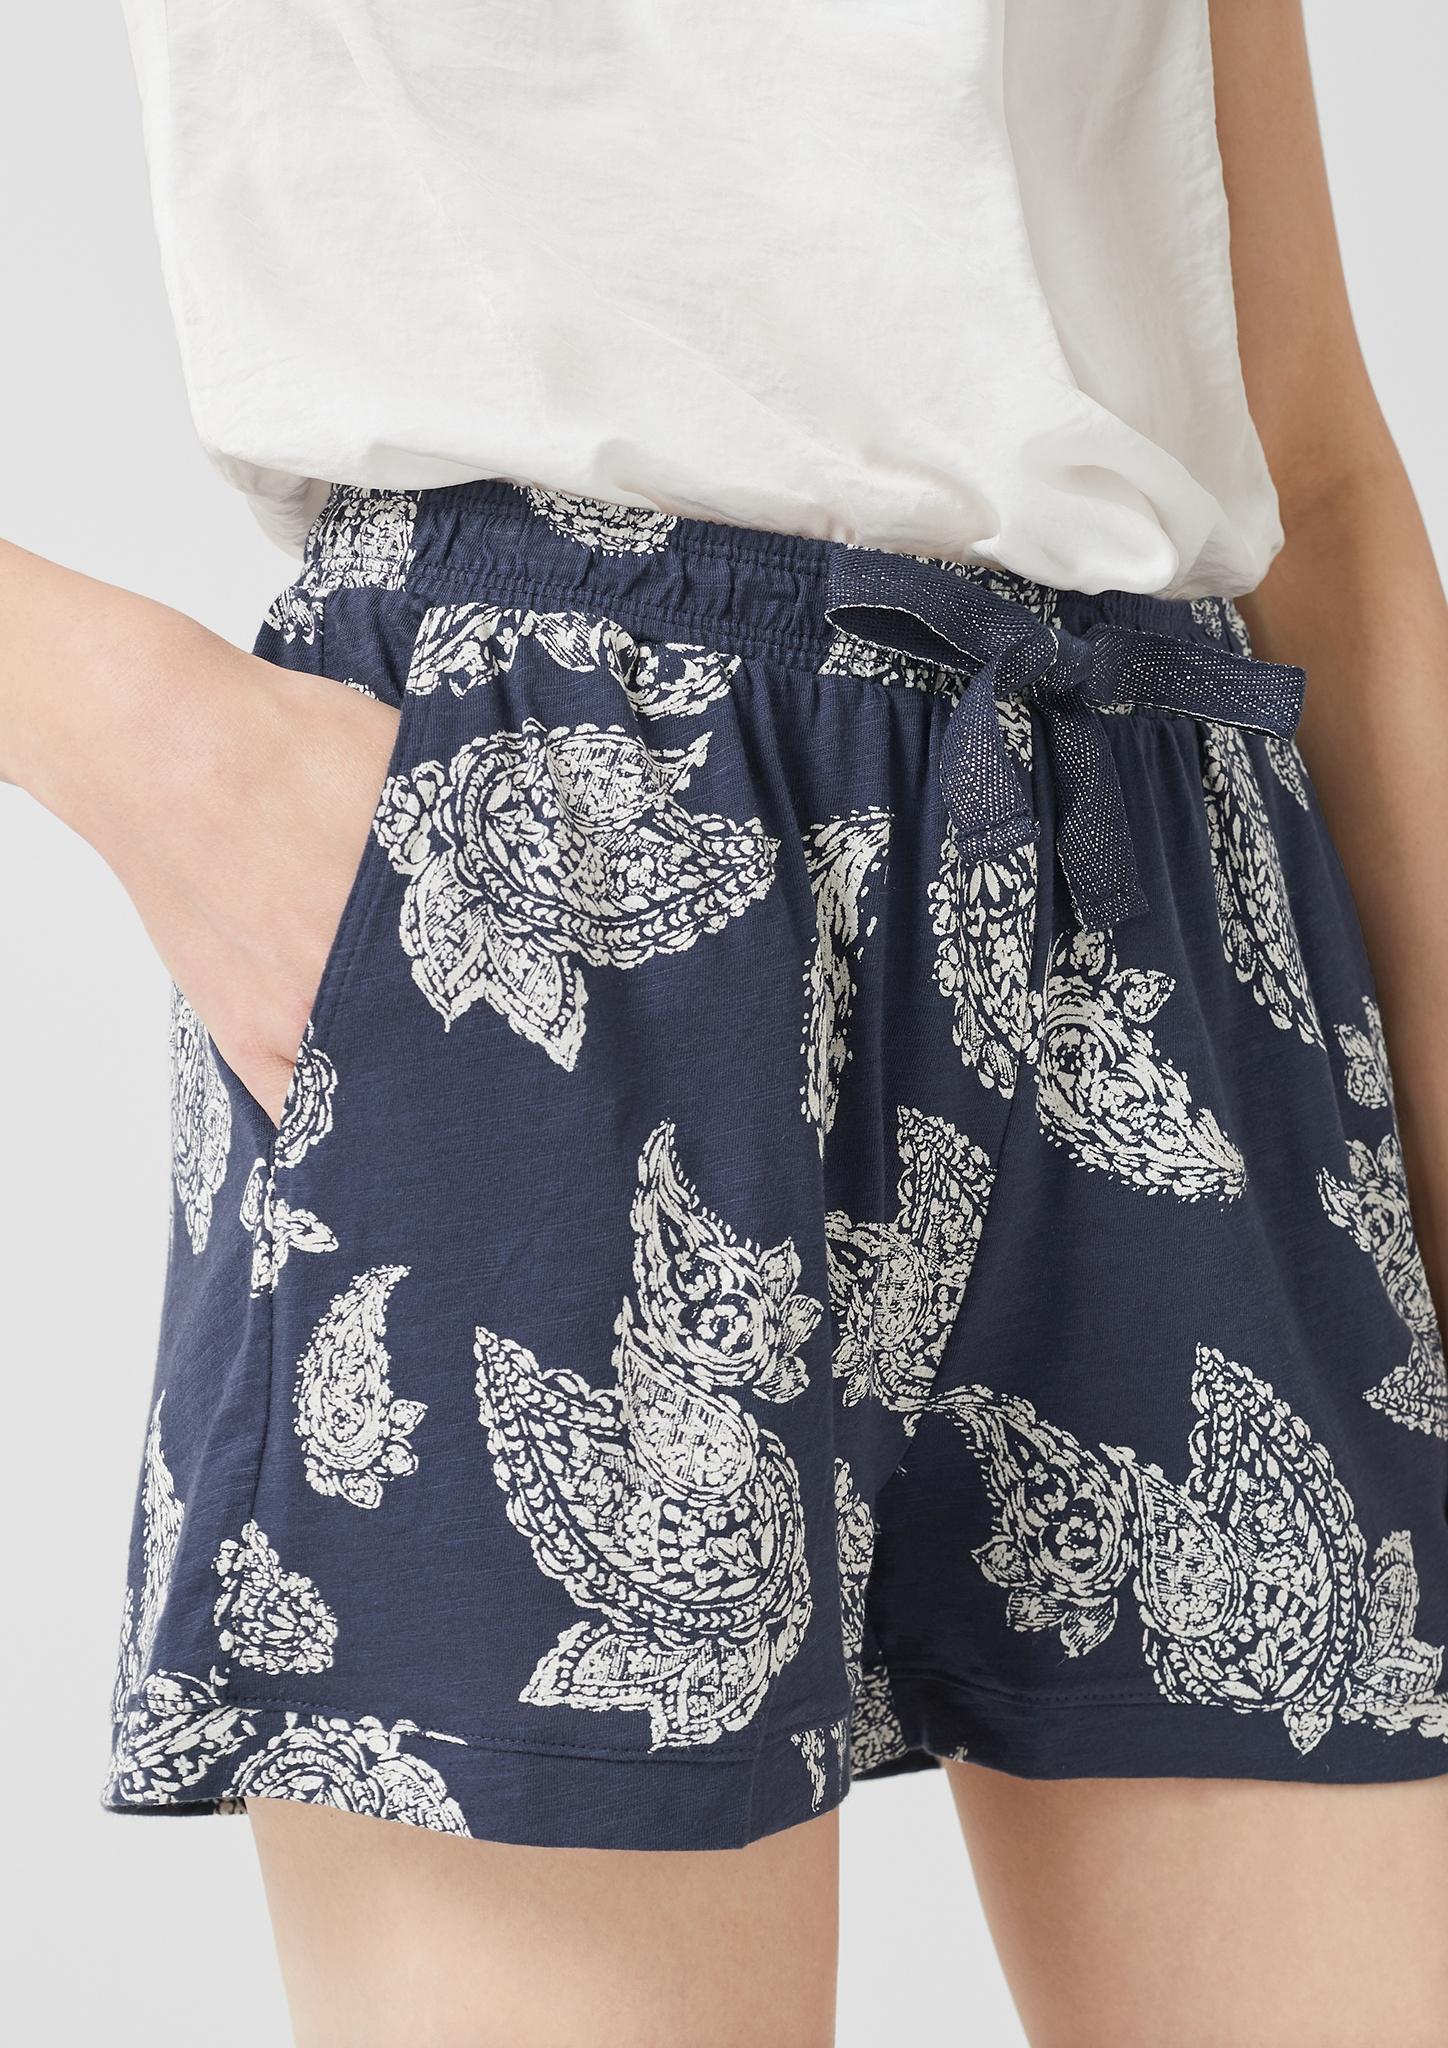 s-Oliver-Casual-Women-Jerseyshorts-mit-Musterprint-Neu Indexbild 6